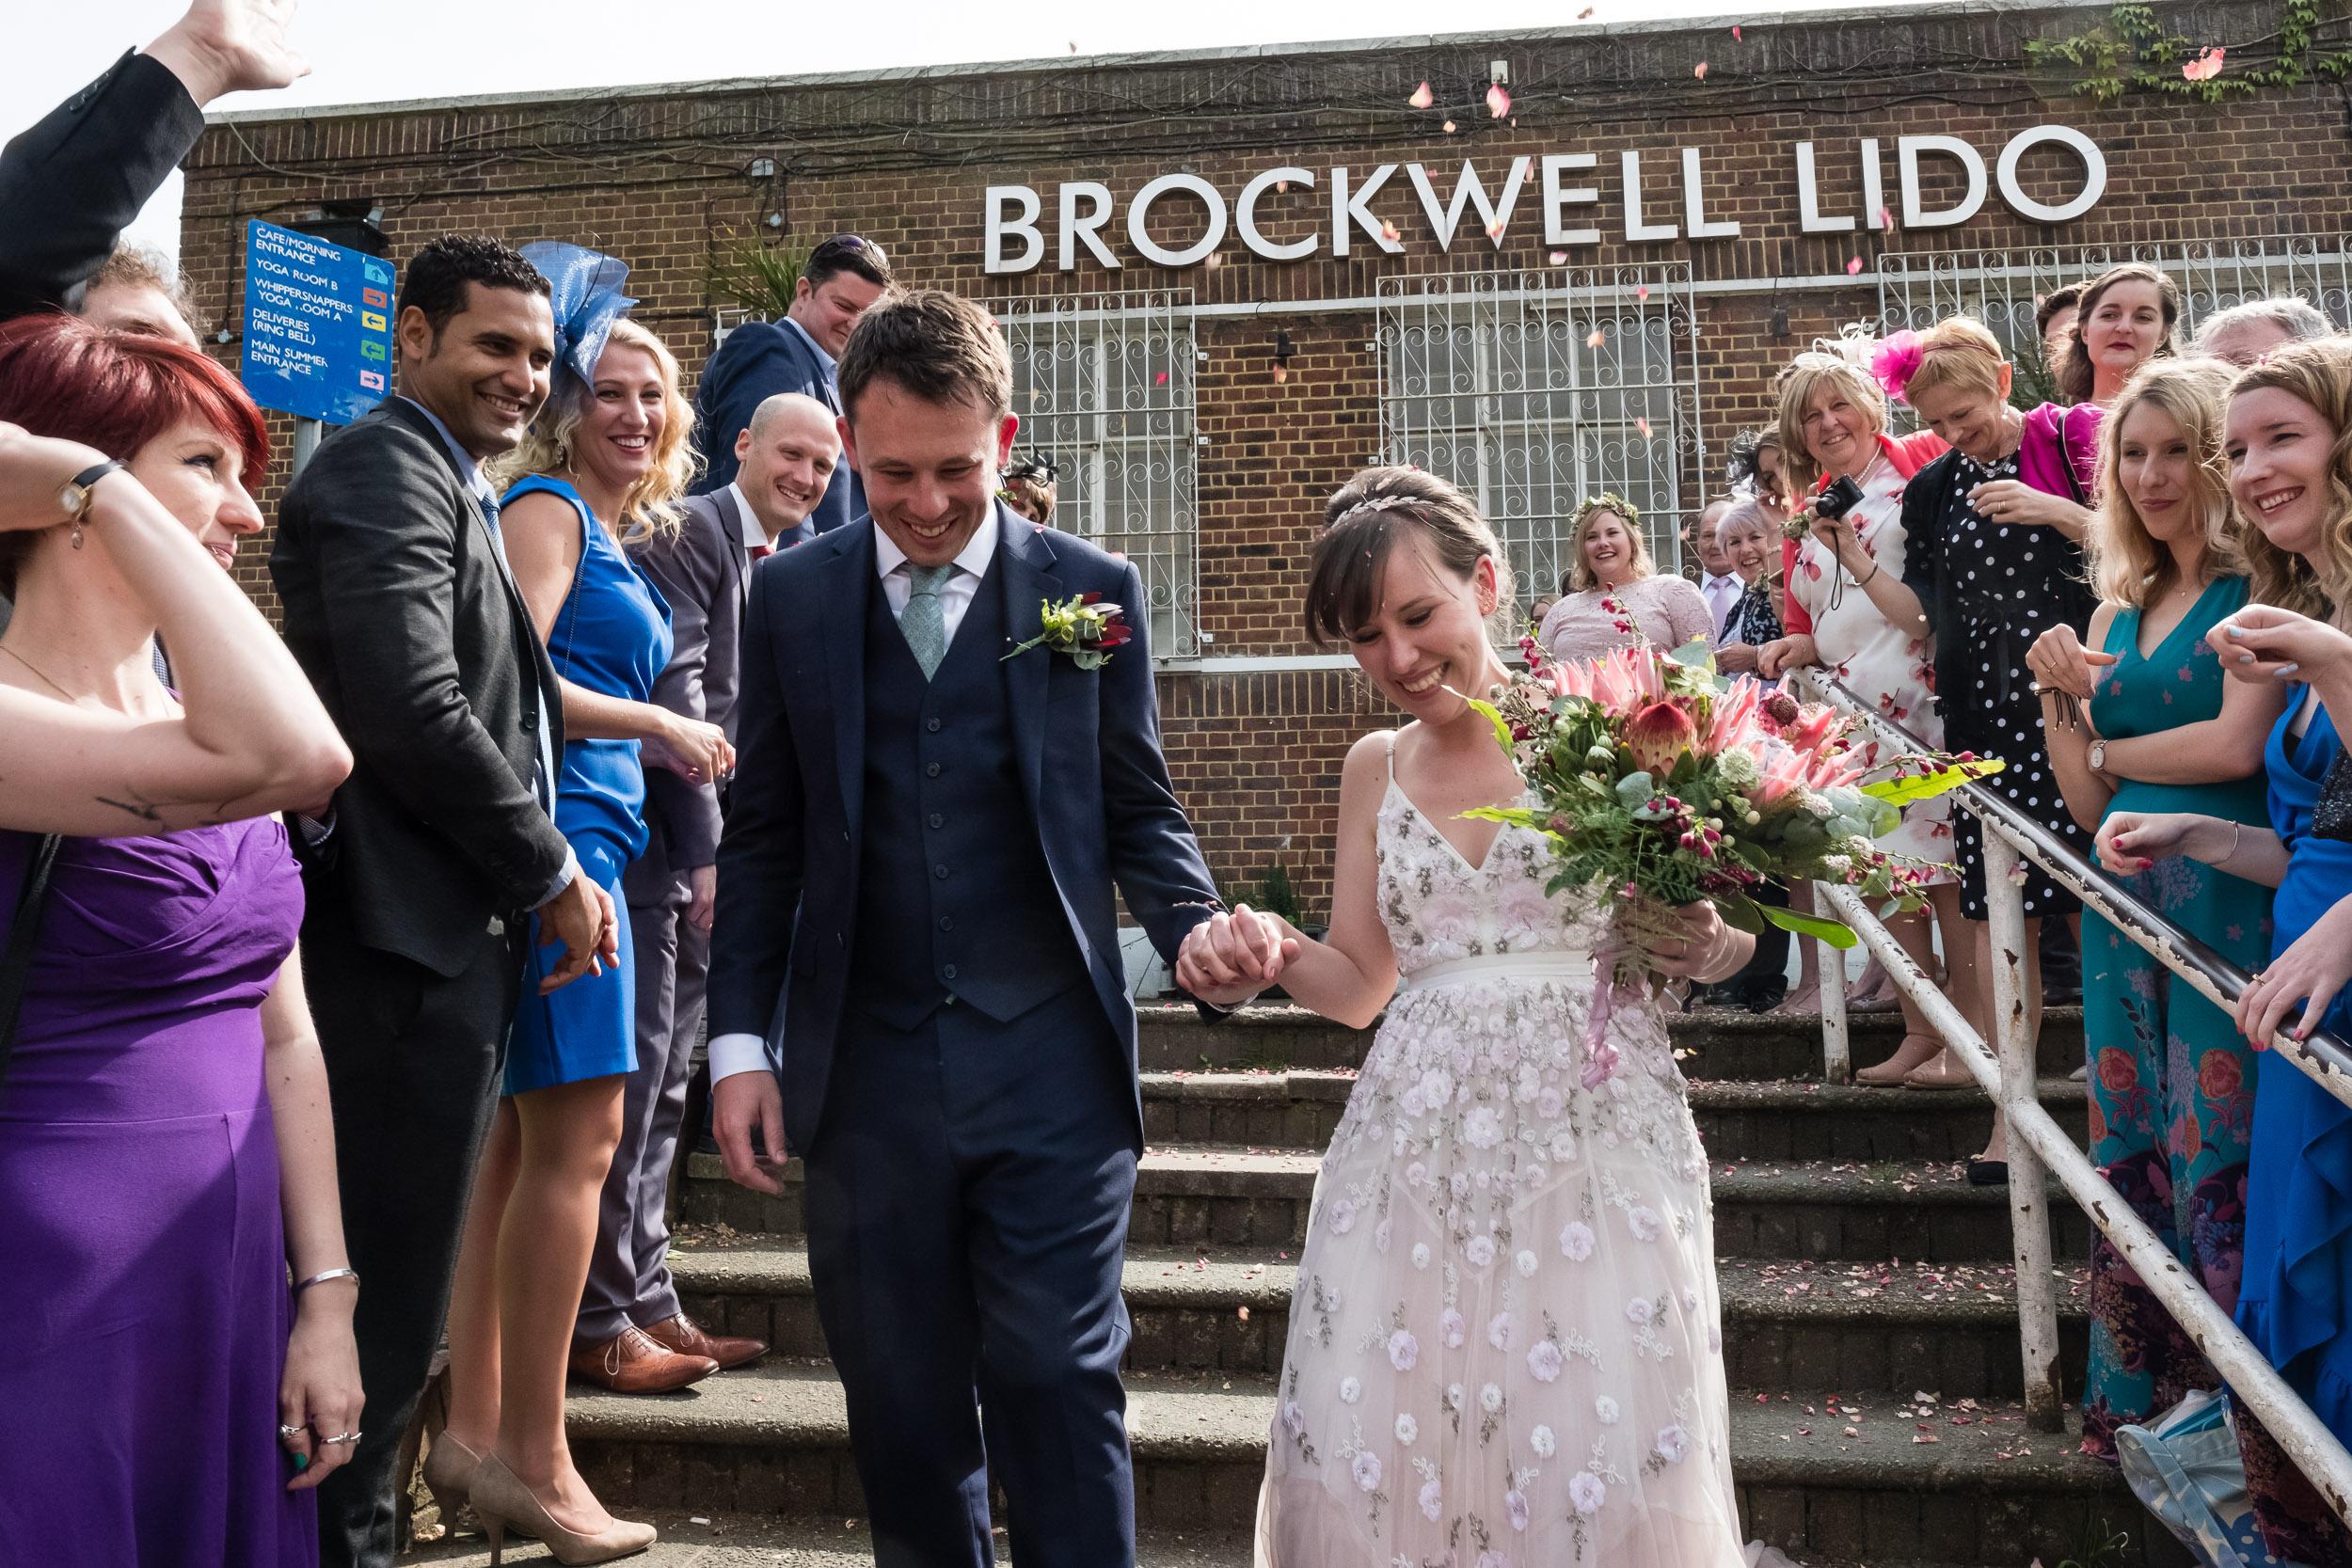 brockwell-lido-brixton-herne-hill-wedding-213.jpg